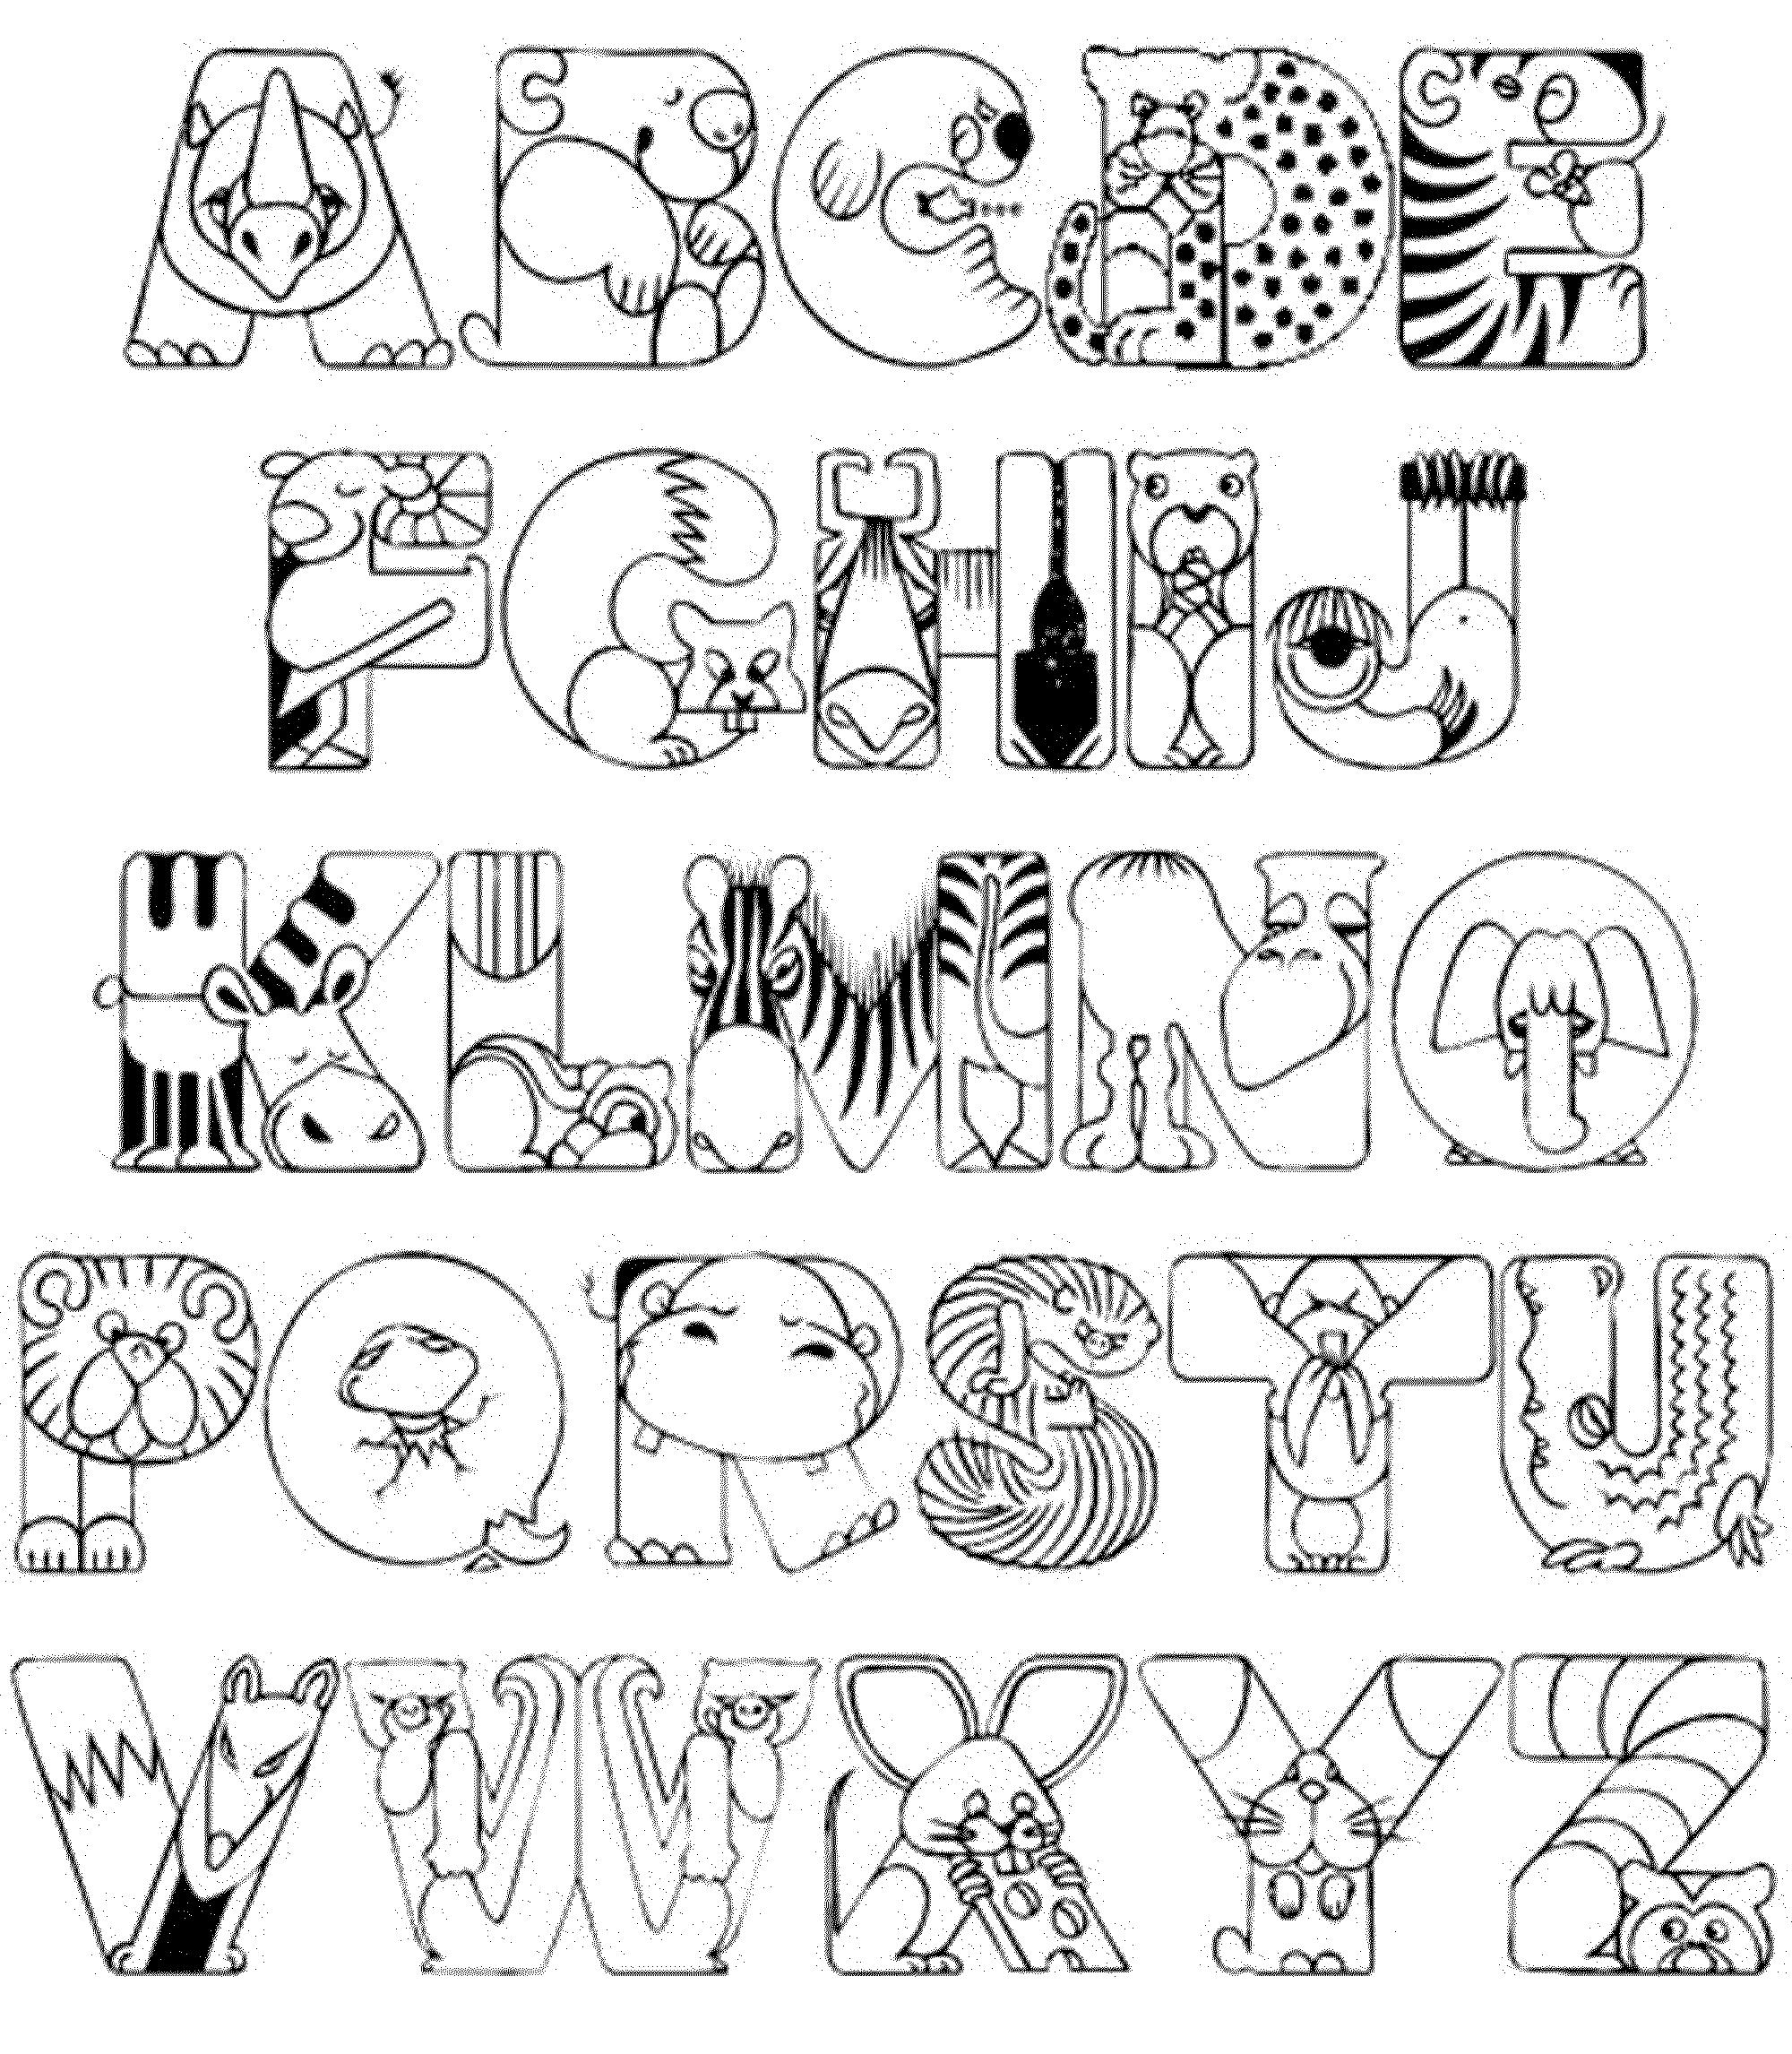 coloring animal alphabet free printable alphabet coloring pages for kids best animal coloring alphabet